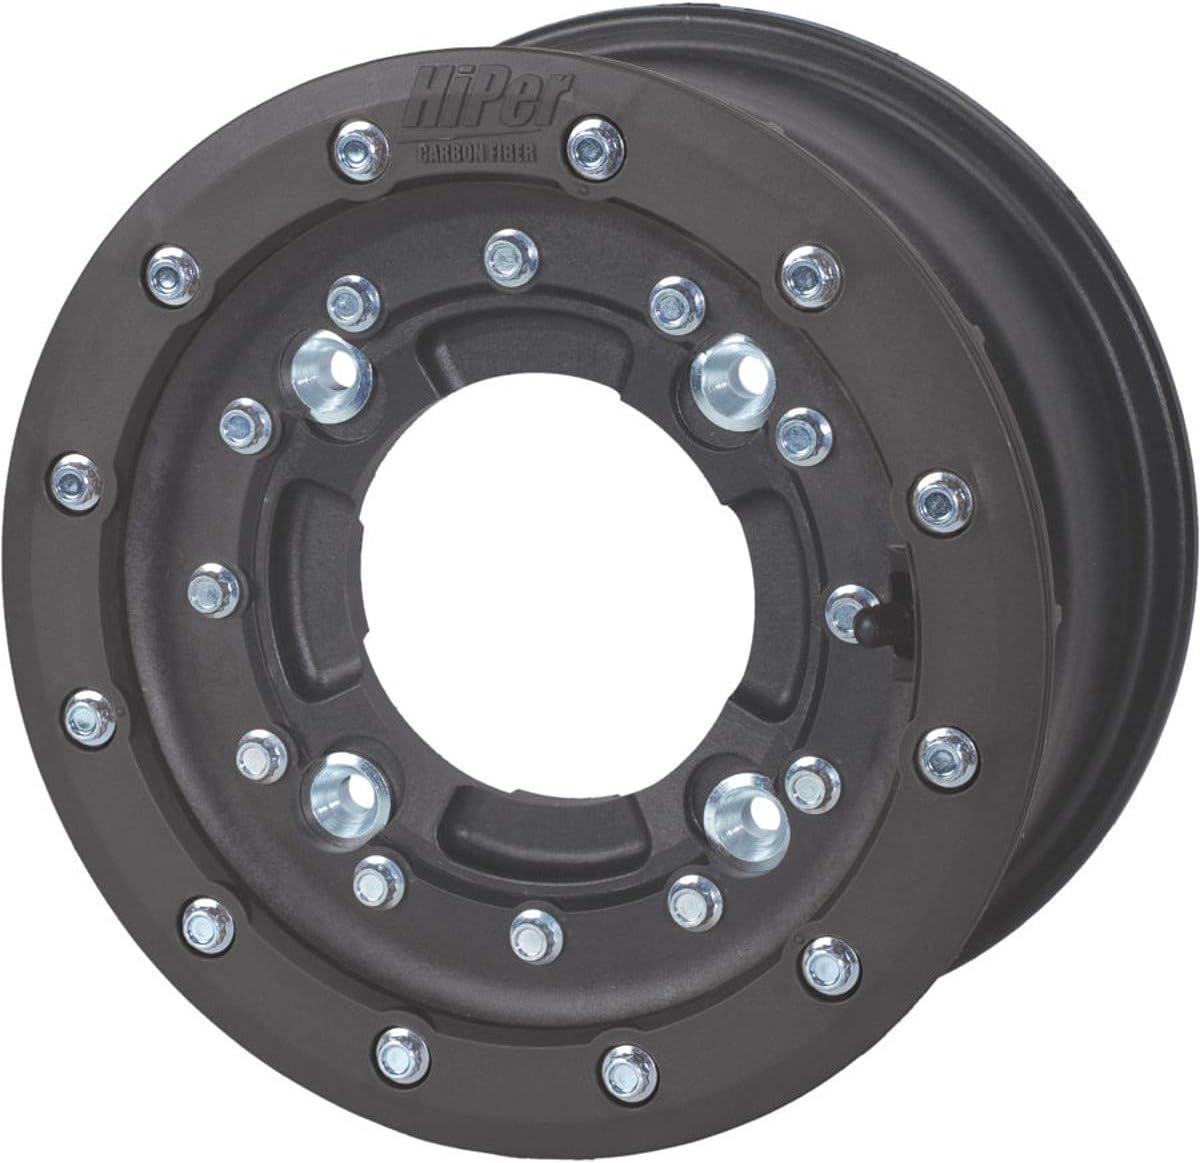 "Hiper Racing CF1 Tech 3 Rear Replacement 8 Inch 8/"" Beadlock Wheel Ring White"